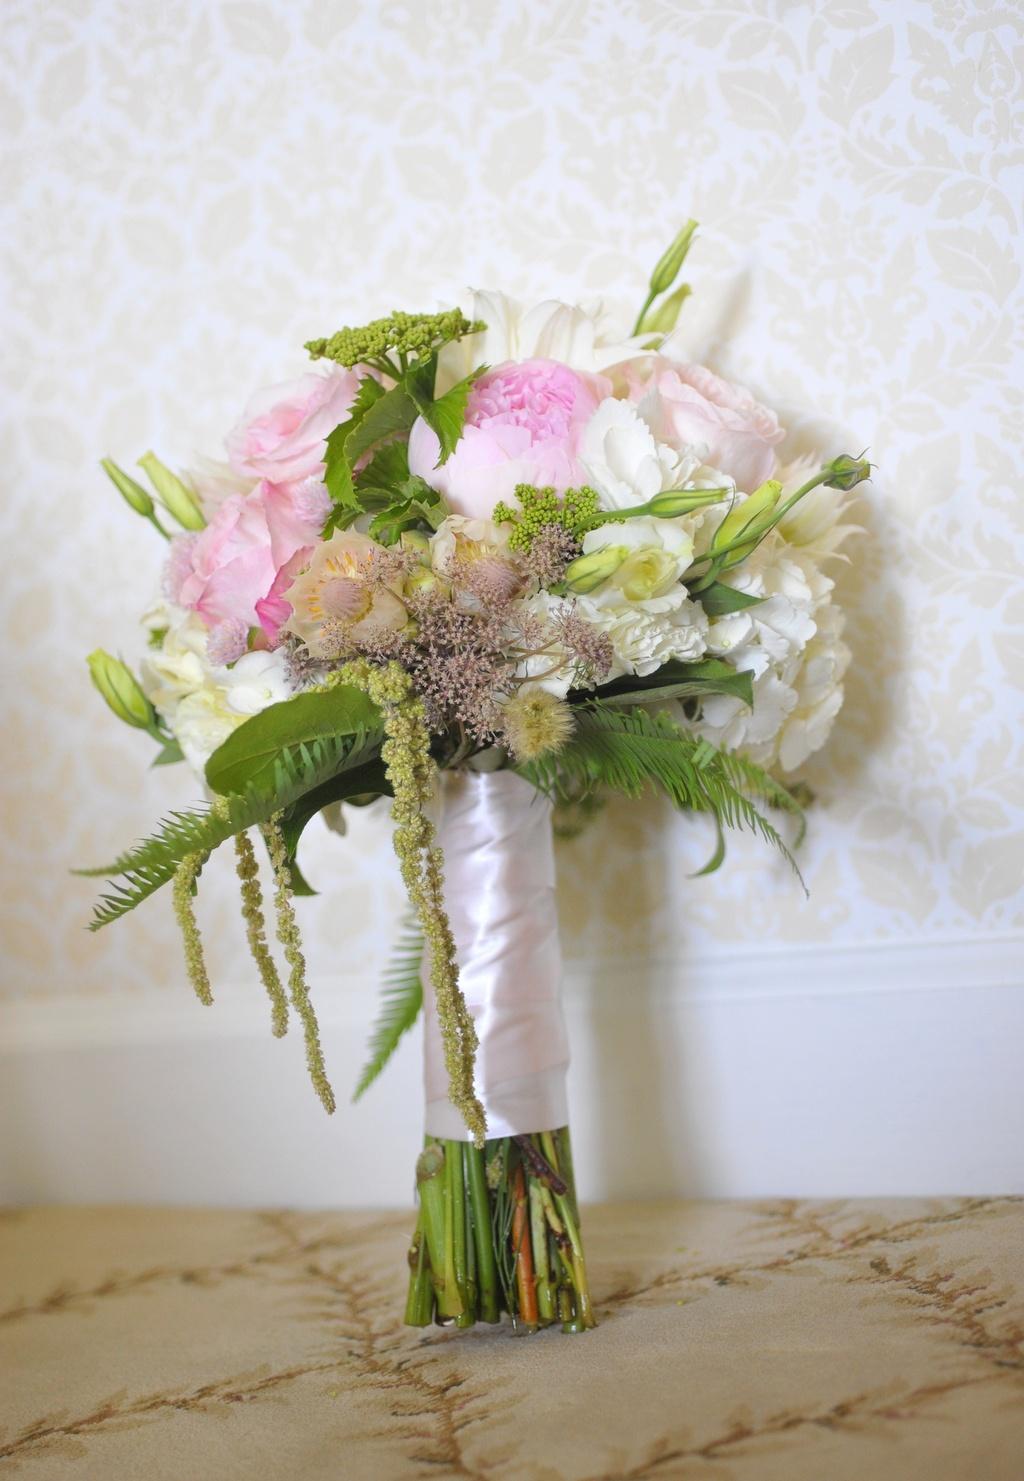 Elegant-real-wedding-north-carolina-estate-venue-romantic-bridal-bouquet.full